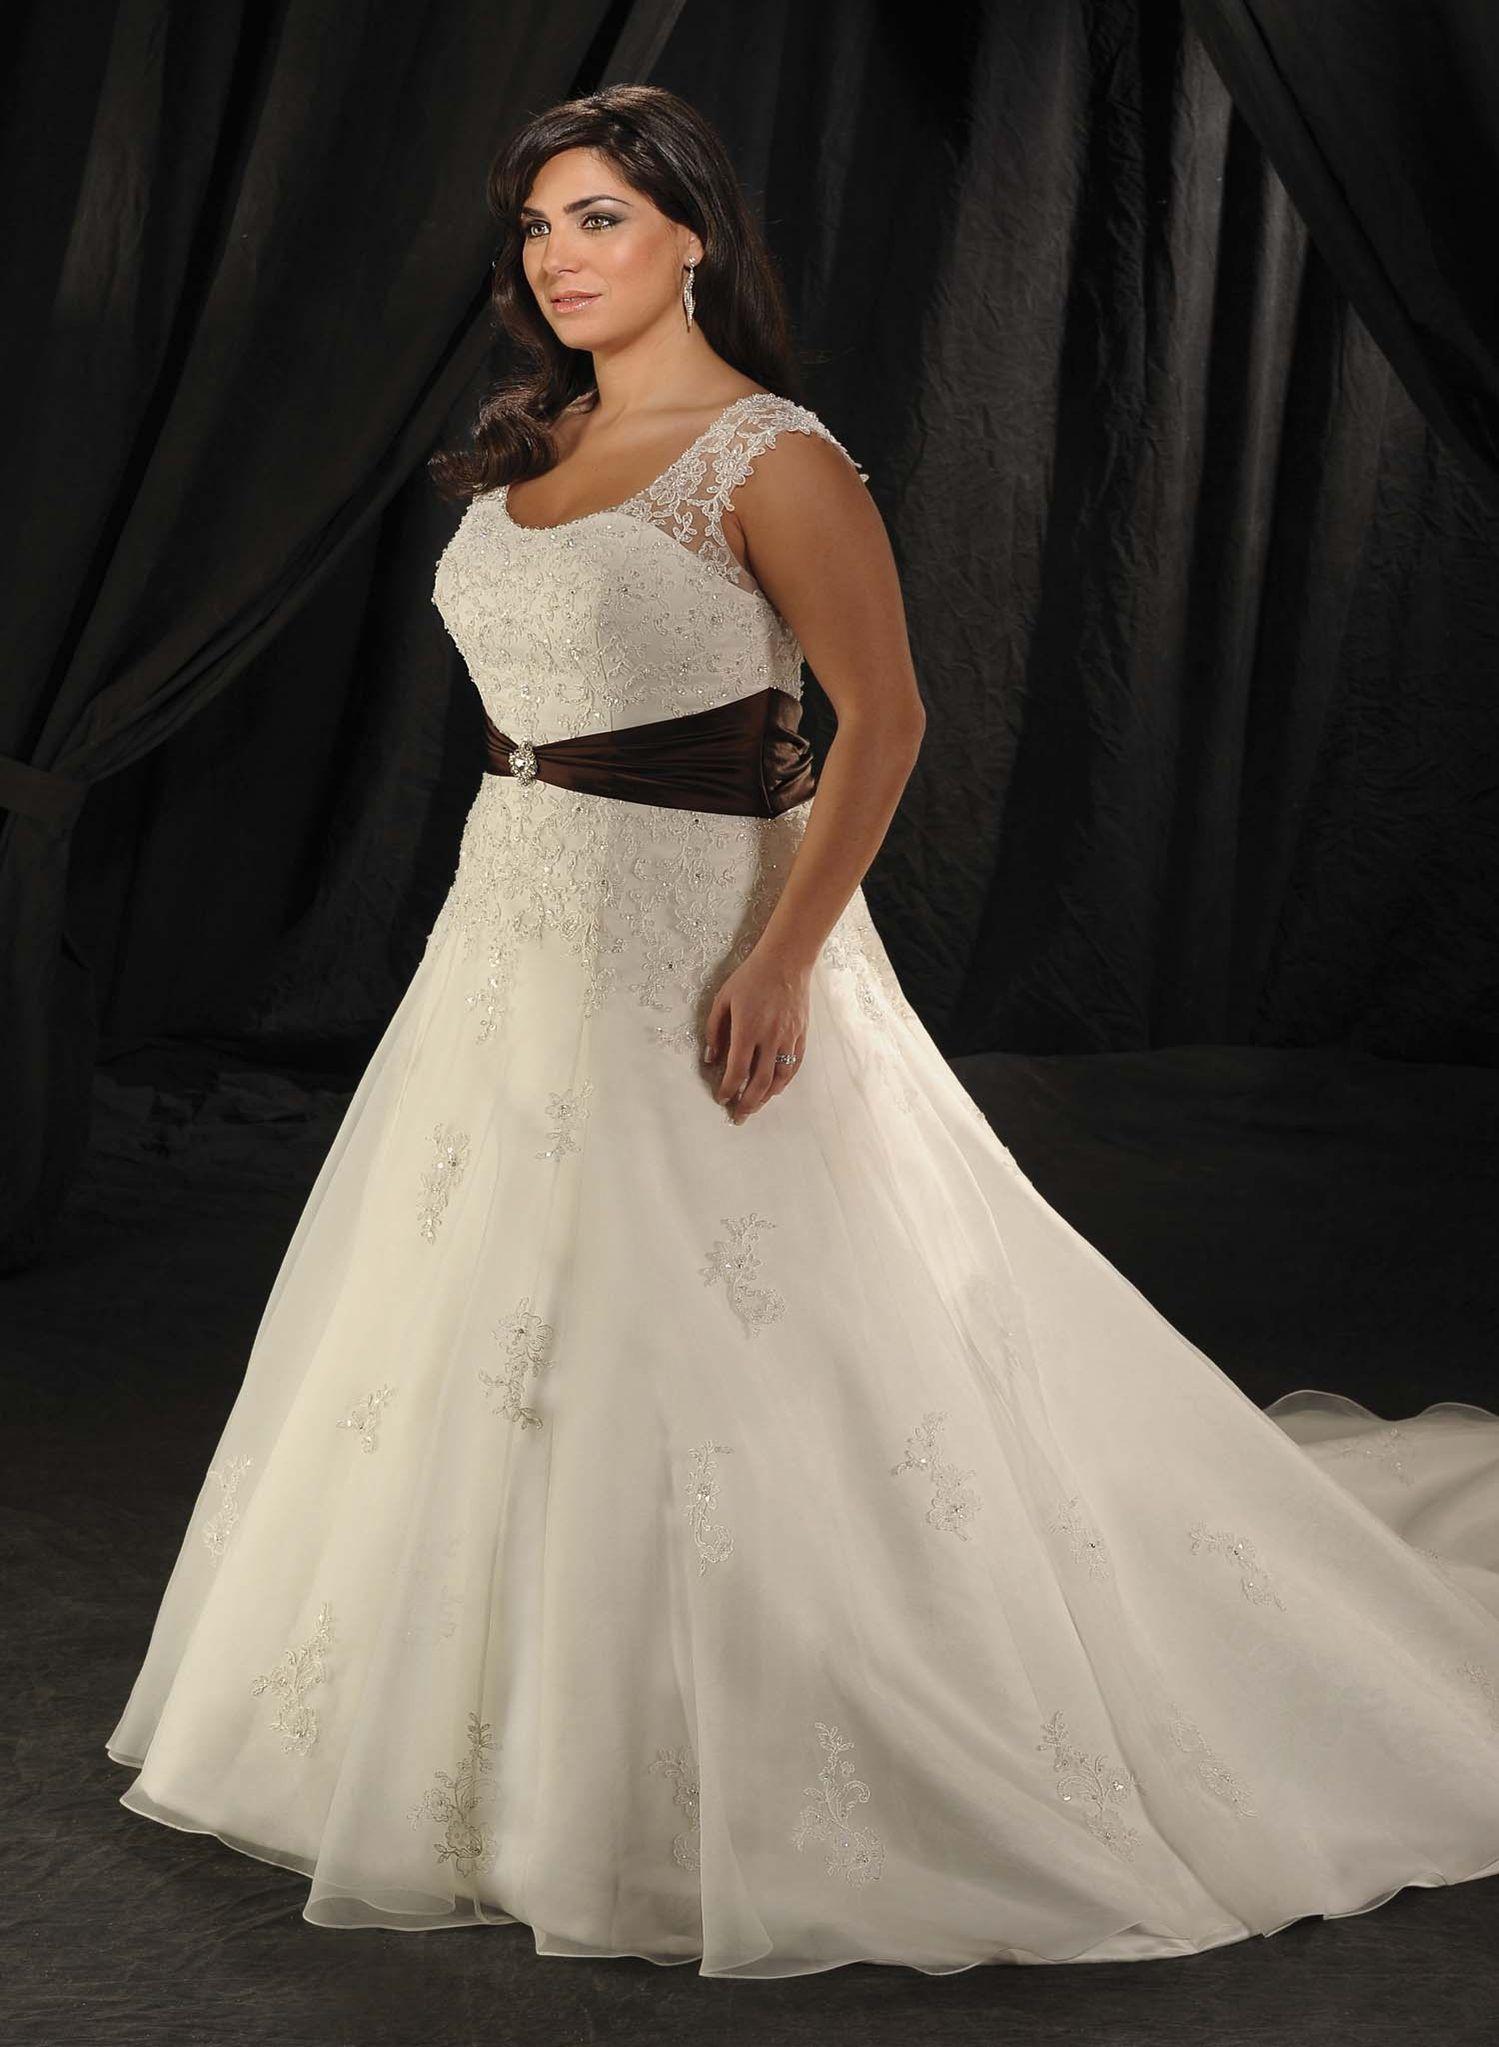 Affordable Plus Size Wedding Dresses | Plus Size Wedding Dress ...